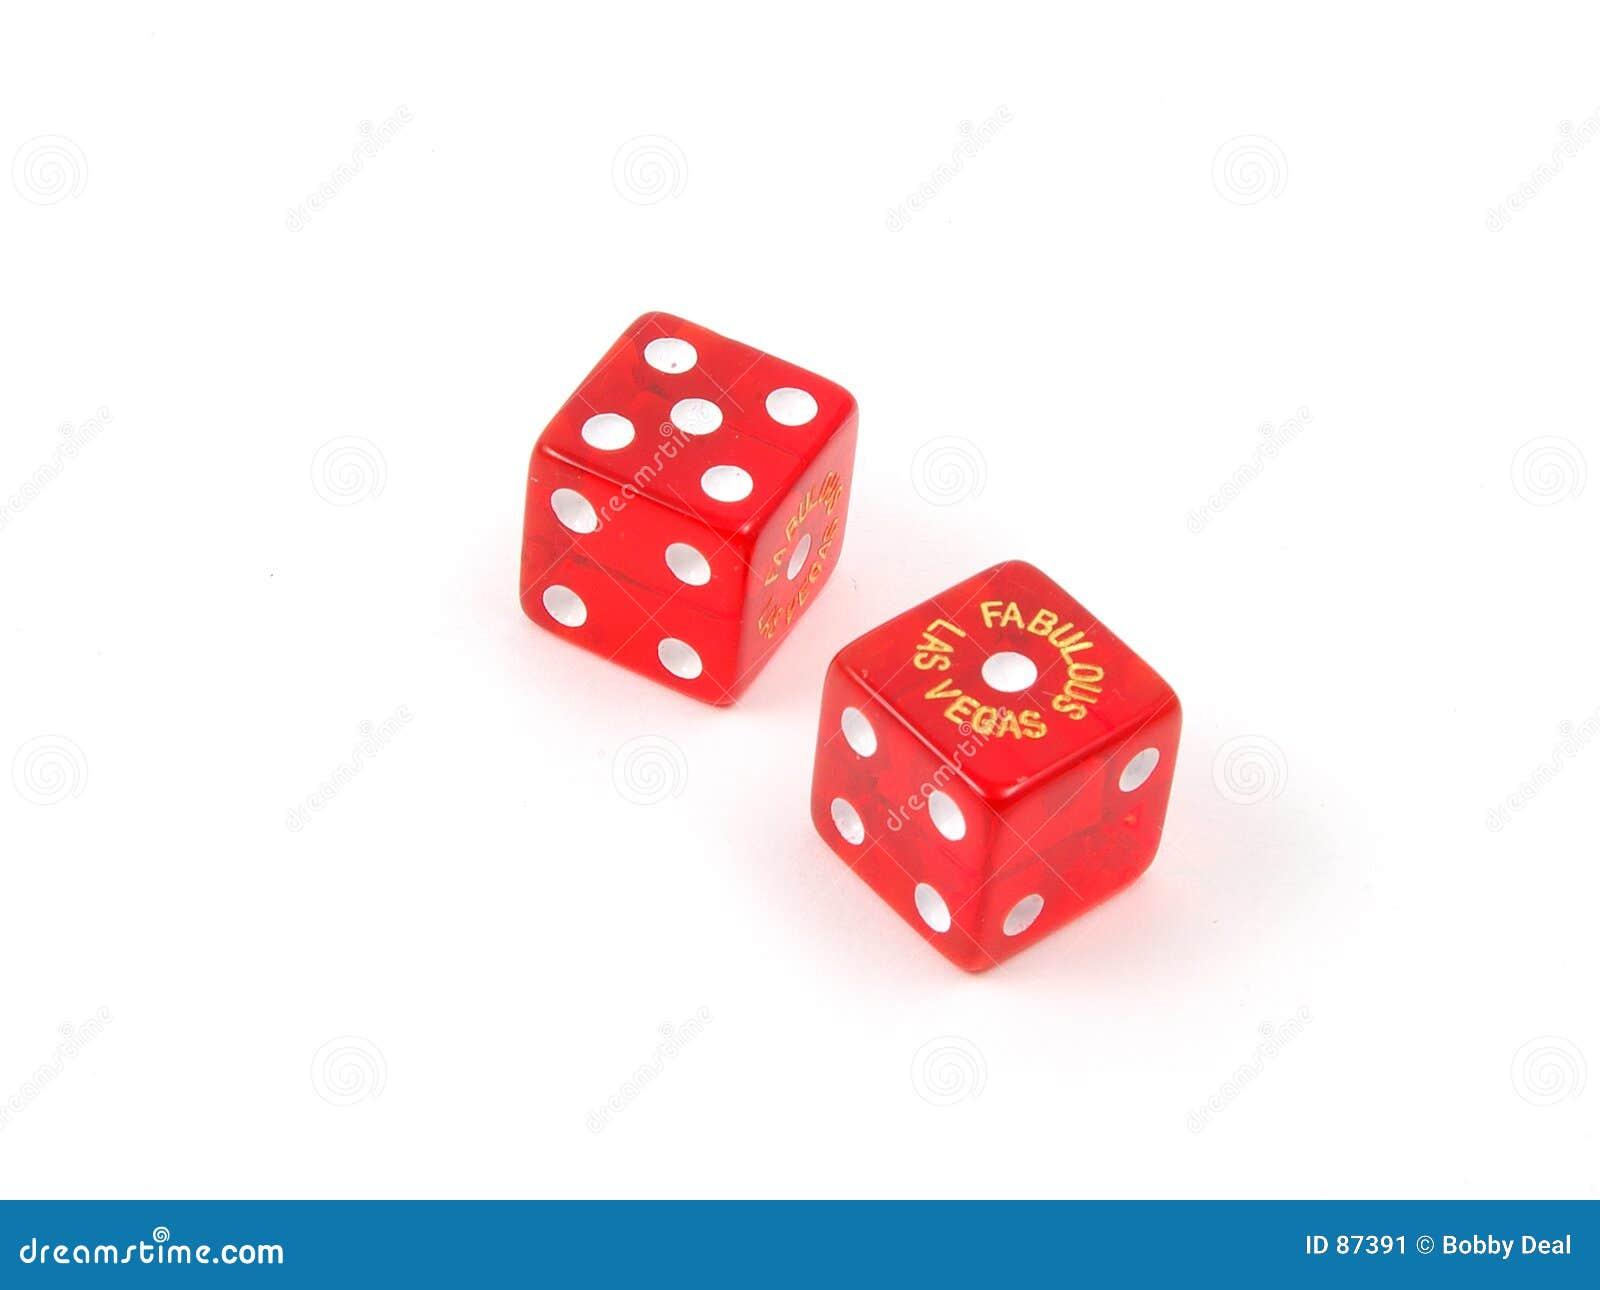 Gambling new york illegal